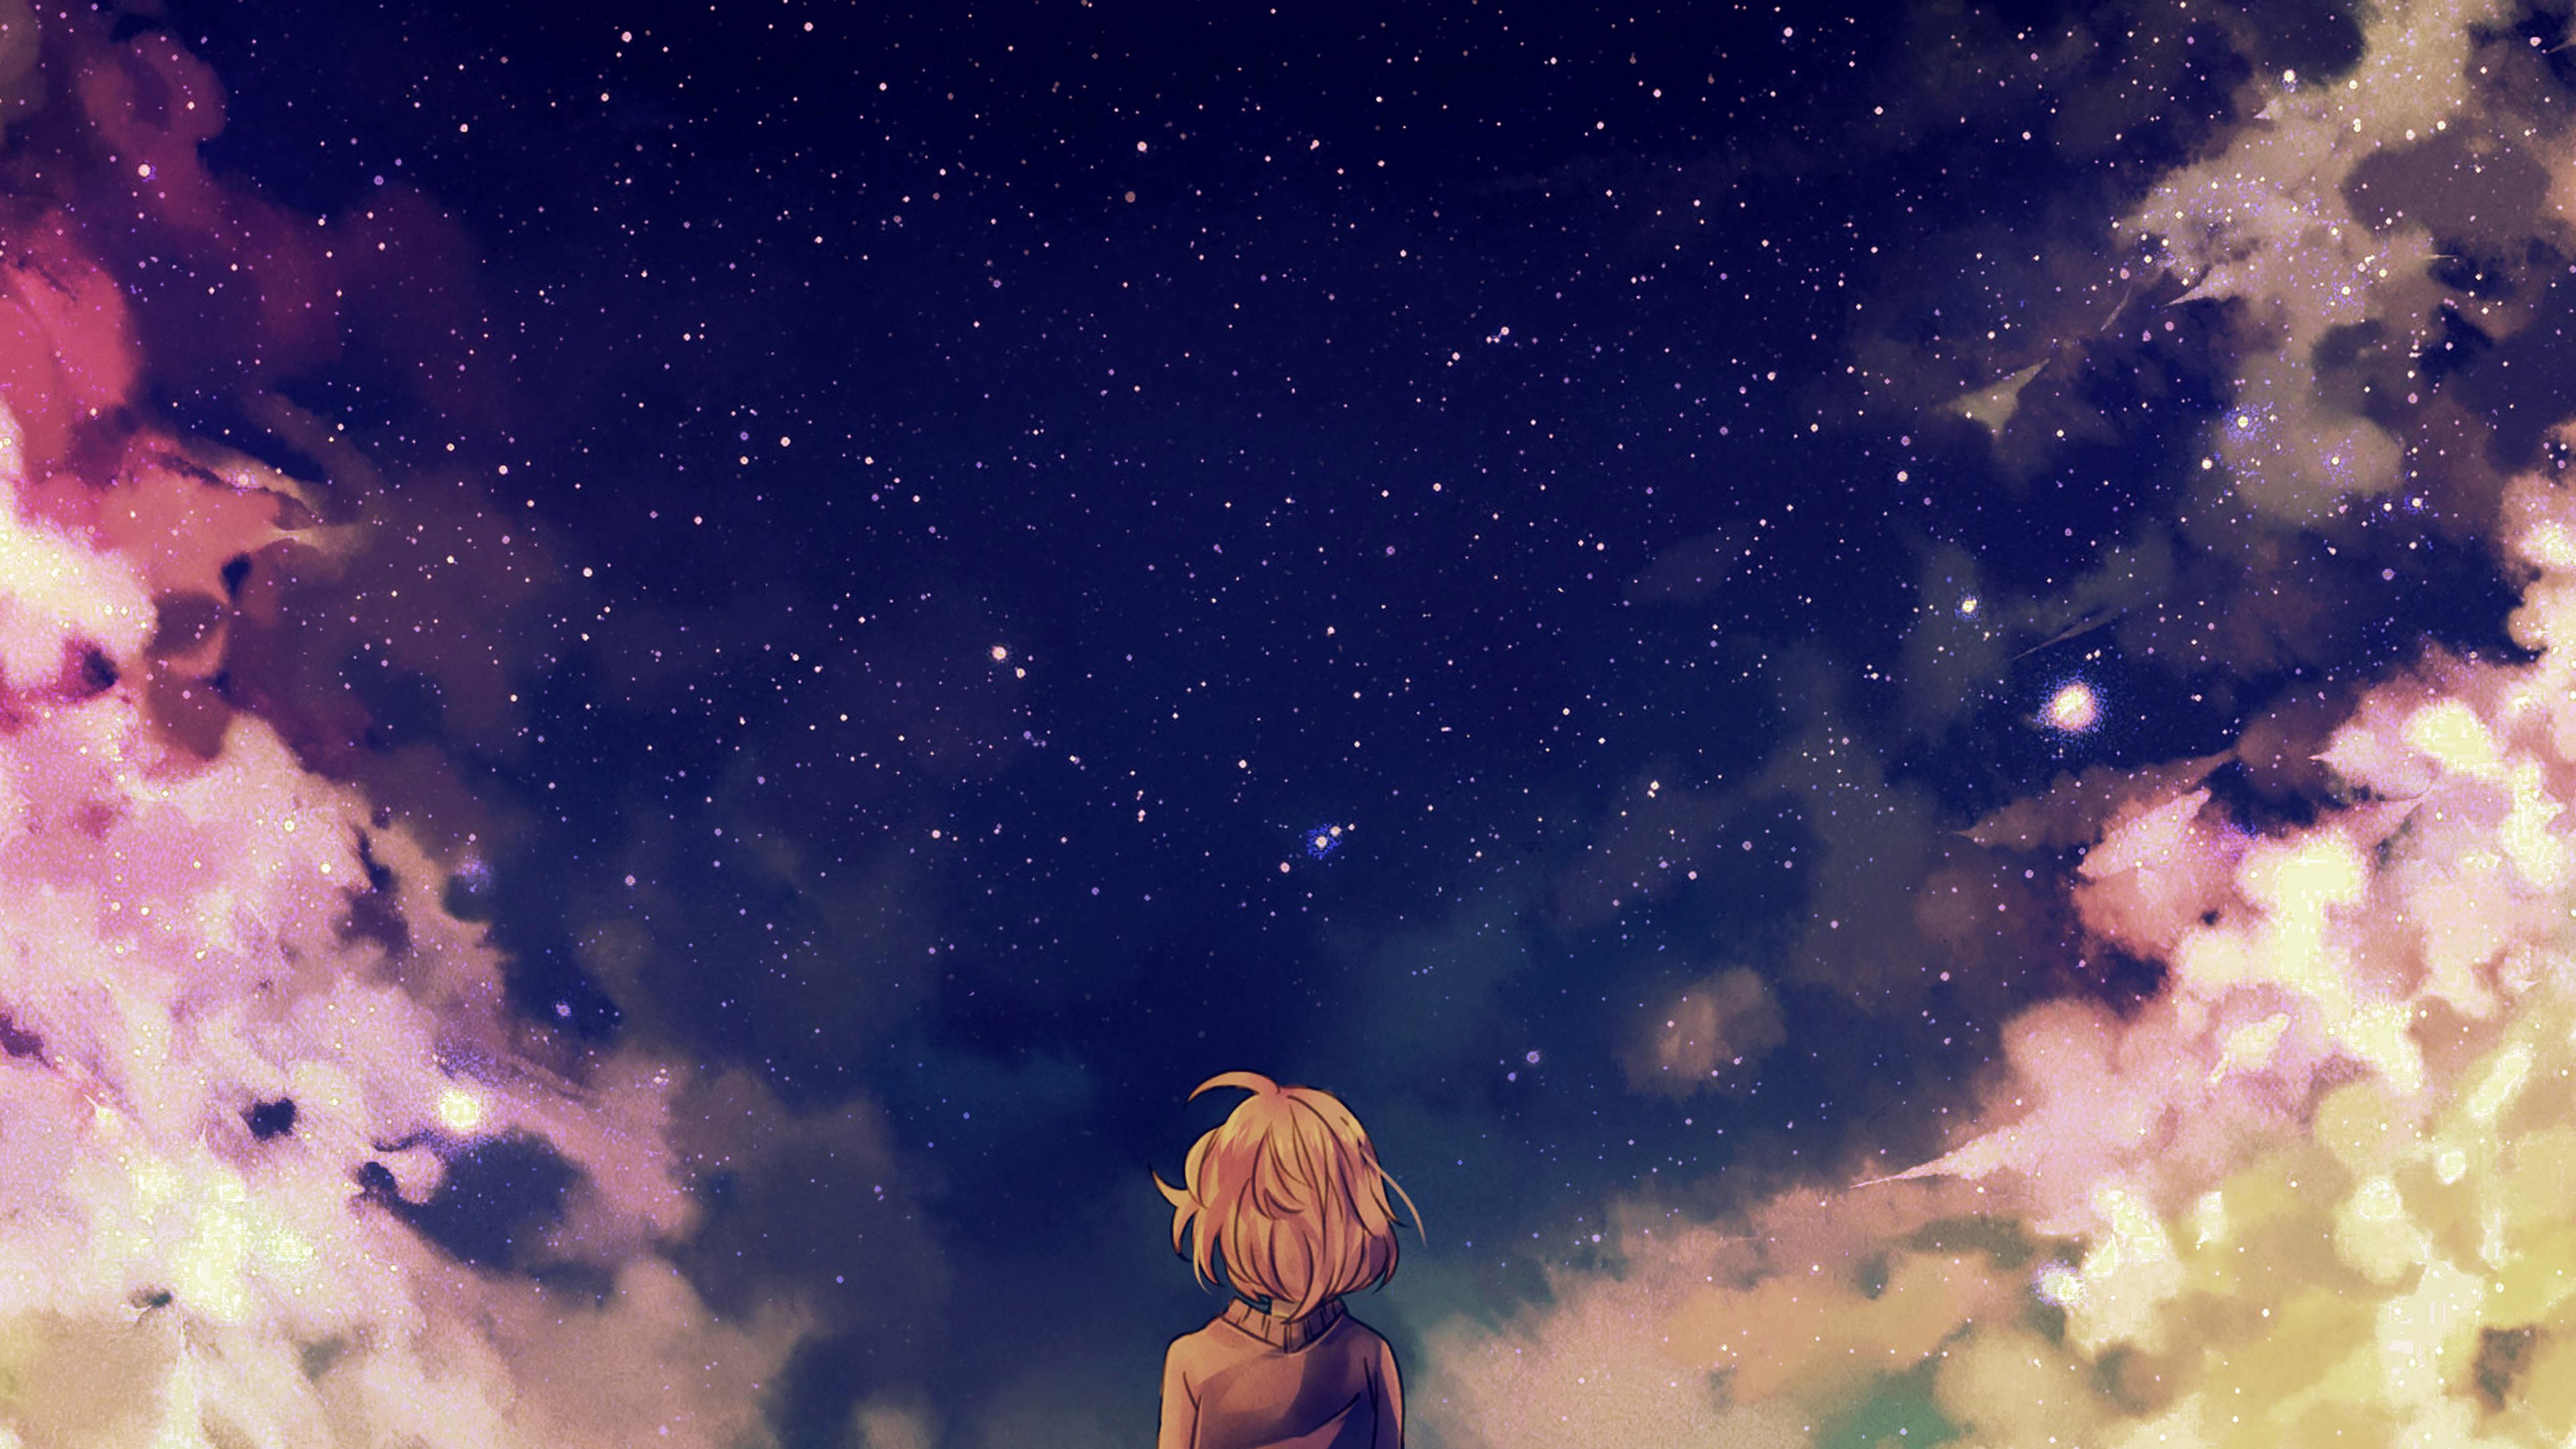 Simple Girl Wallpaper Pc Ad65 Starry Space Illust Anime Girl Wallpaper